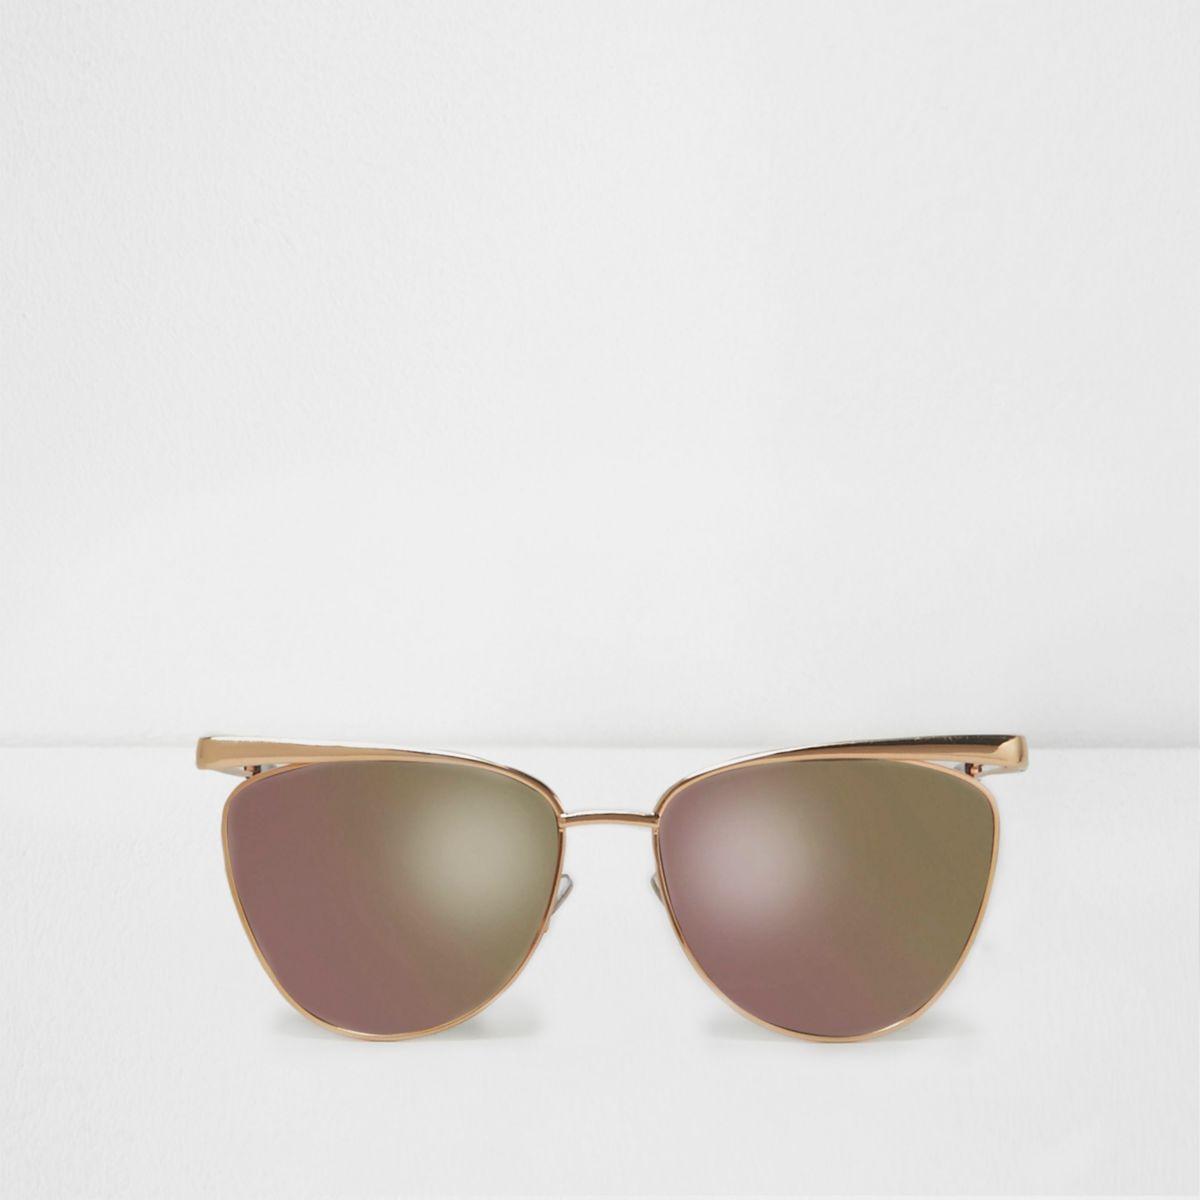 Gold tone cat eye pink mirror sunglasses